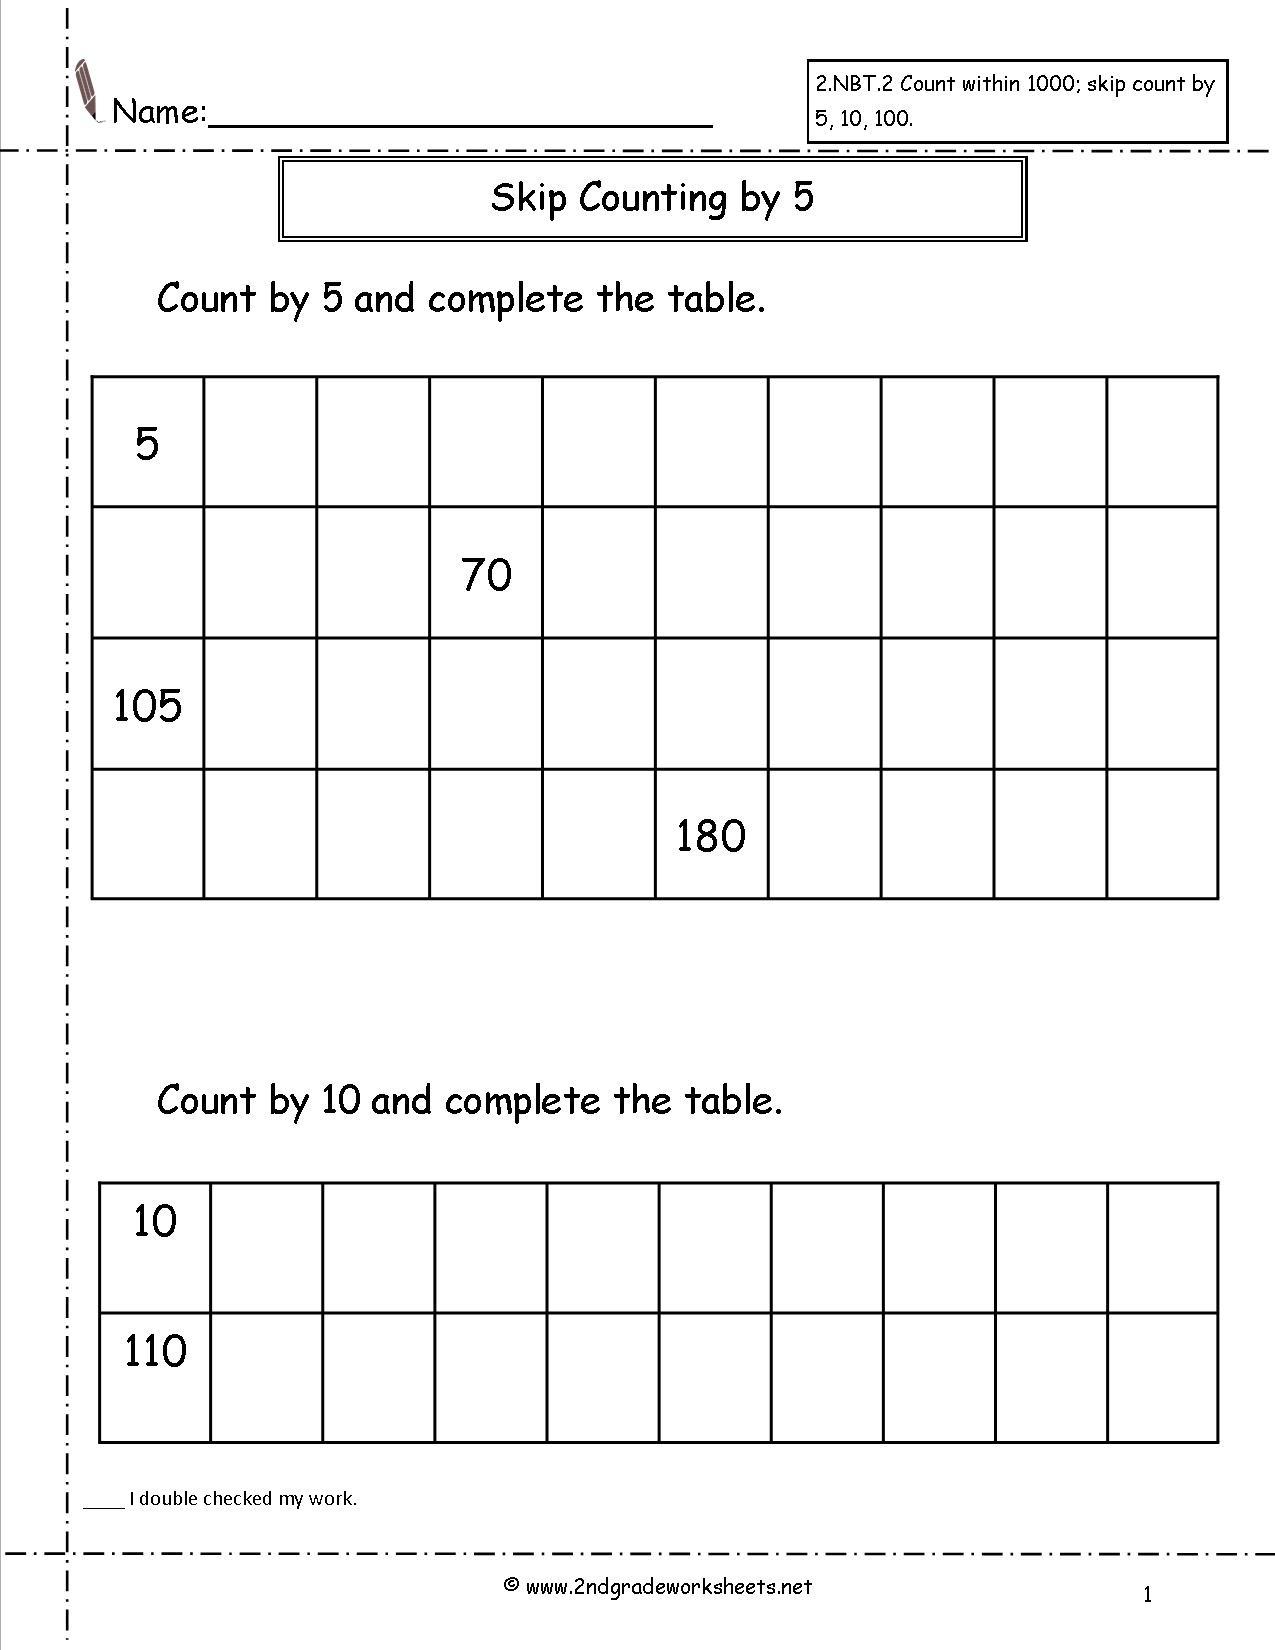 Free Skip Counting Worksheets - Free Printable Skip Counting Worksheets